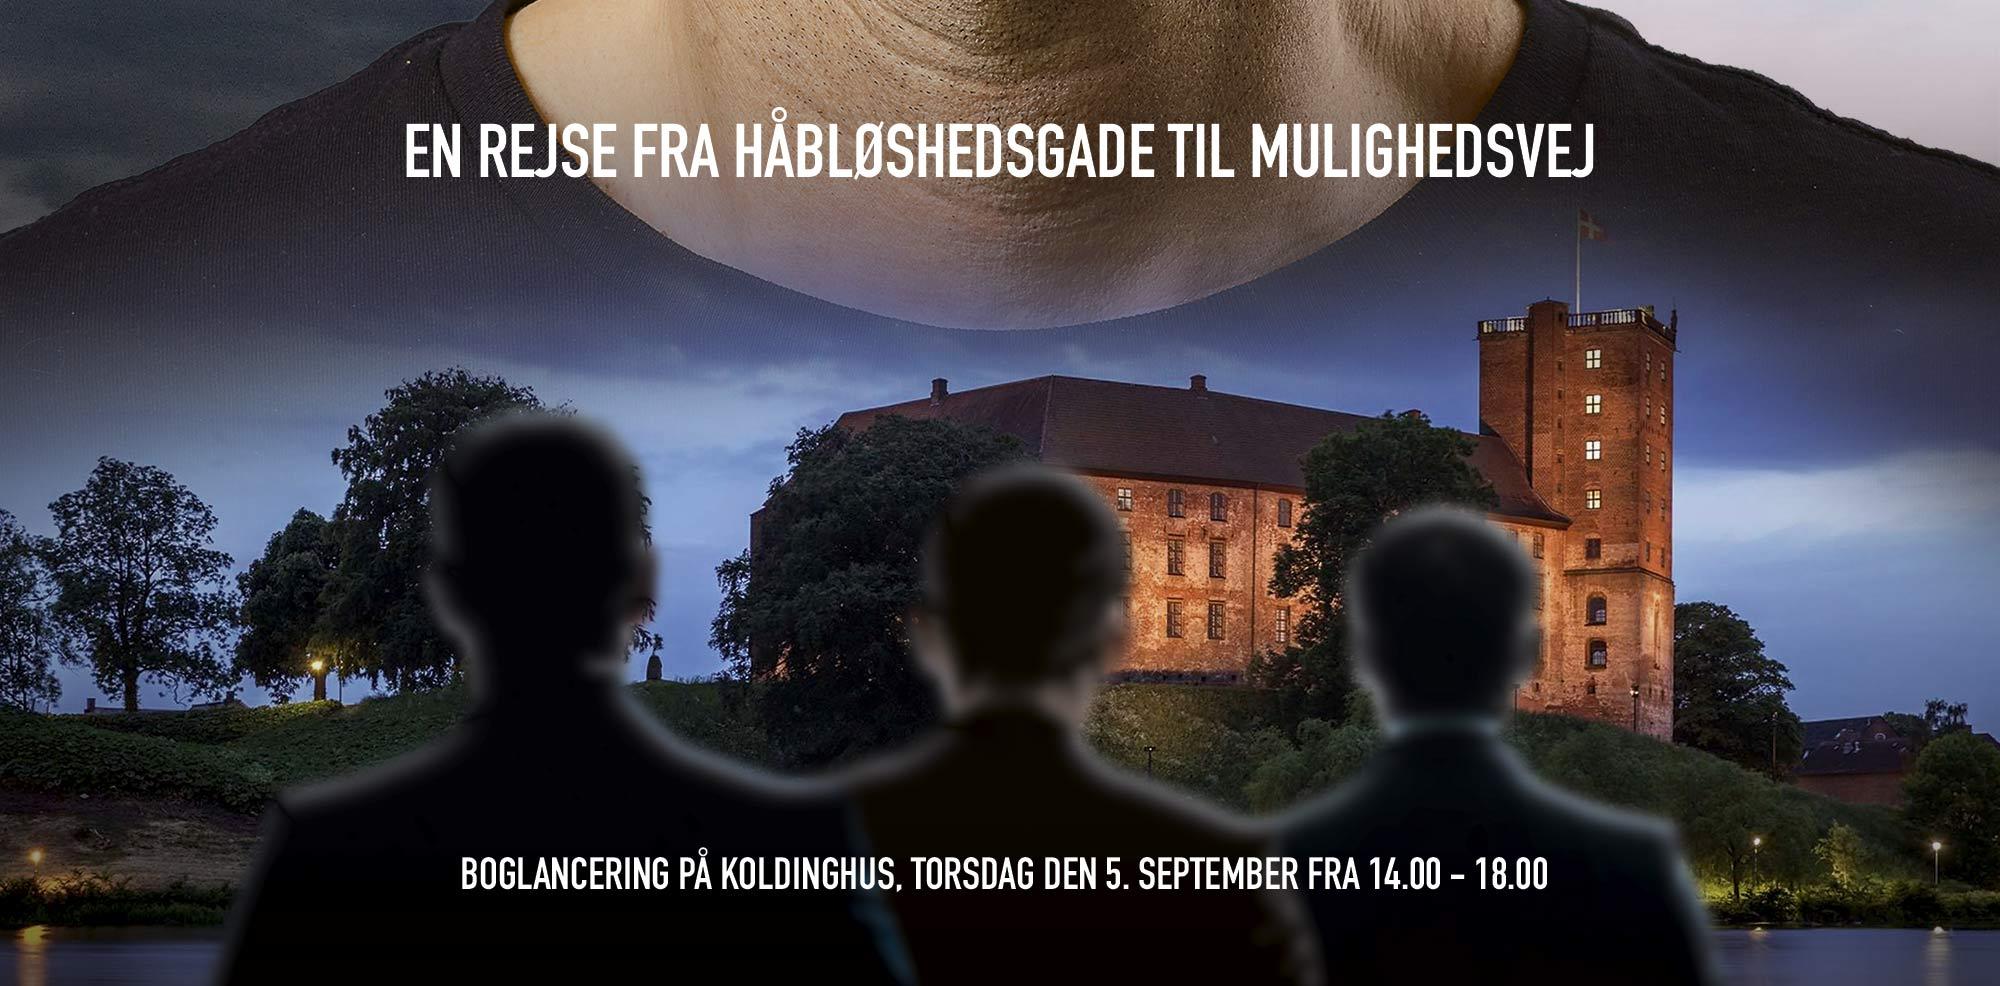 mortenbonde.dk